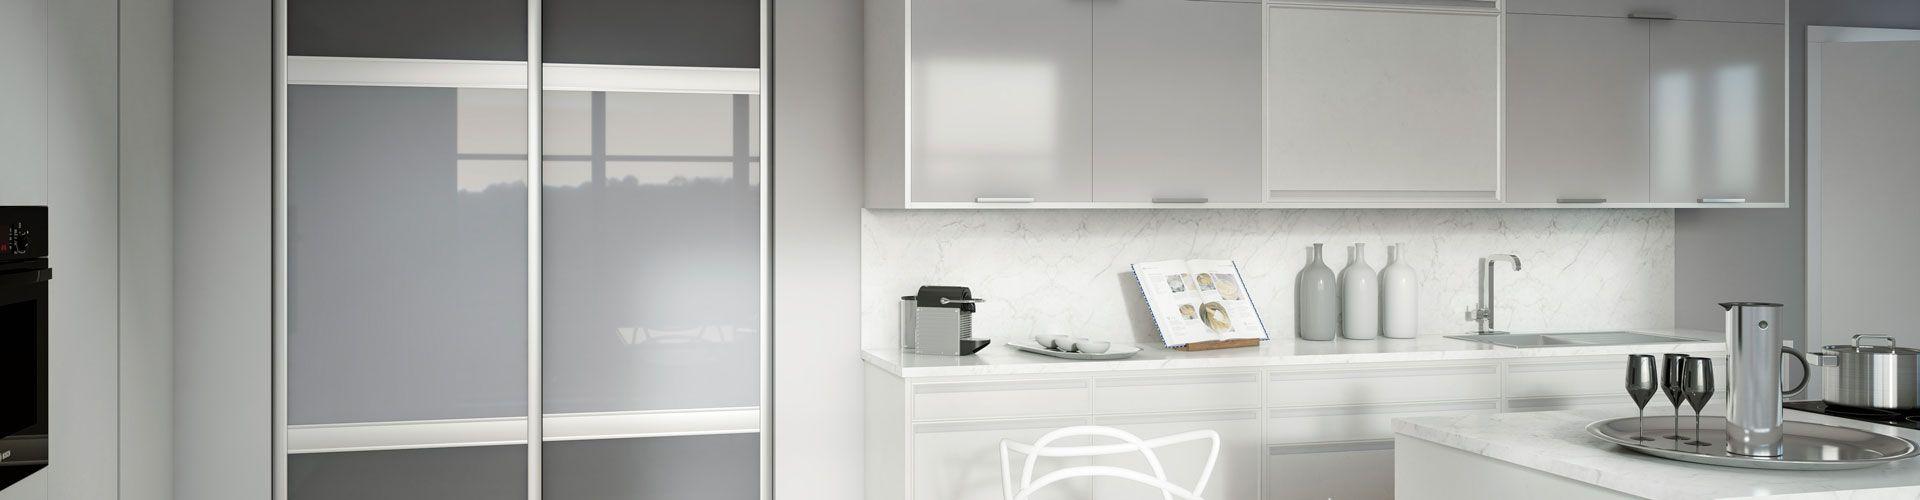 portes de placard grises et traverses kazed. Black Bedroom Furniture Sets. Home Design Ideas